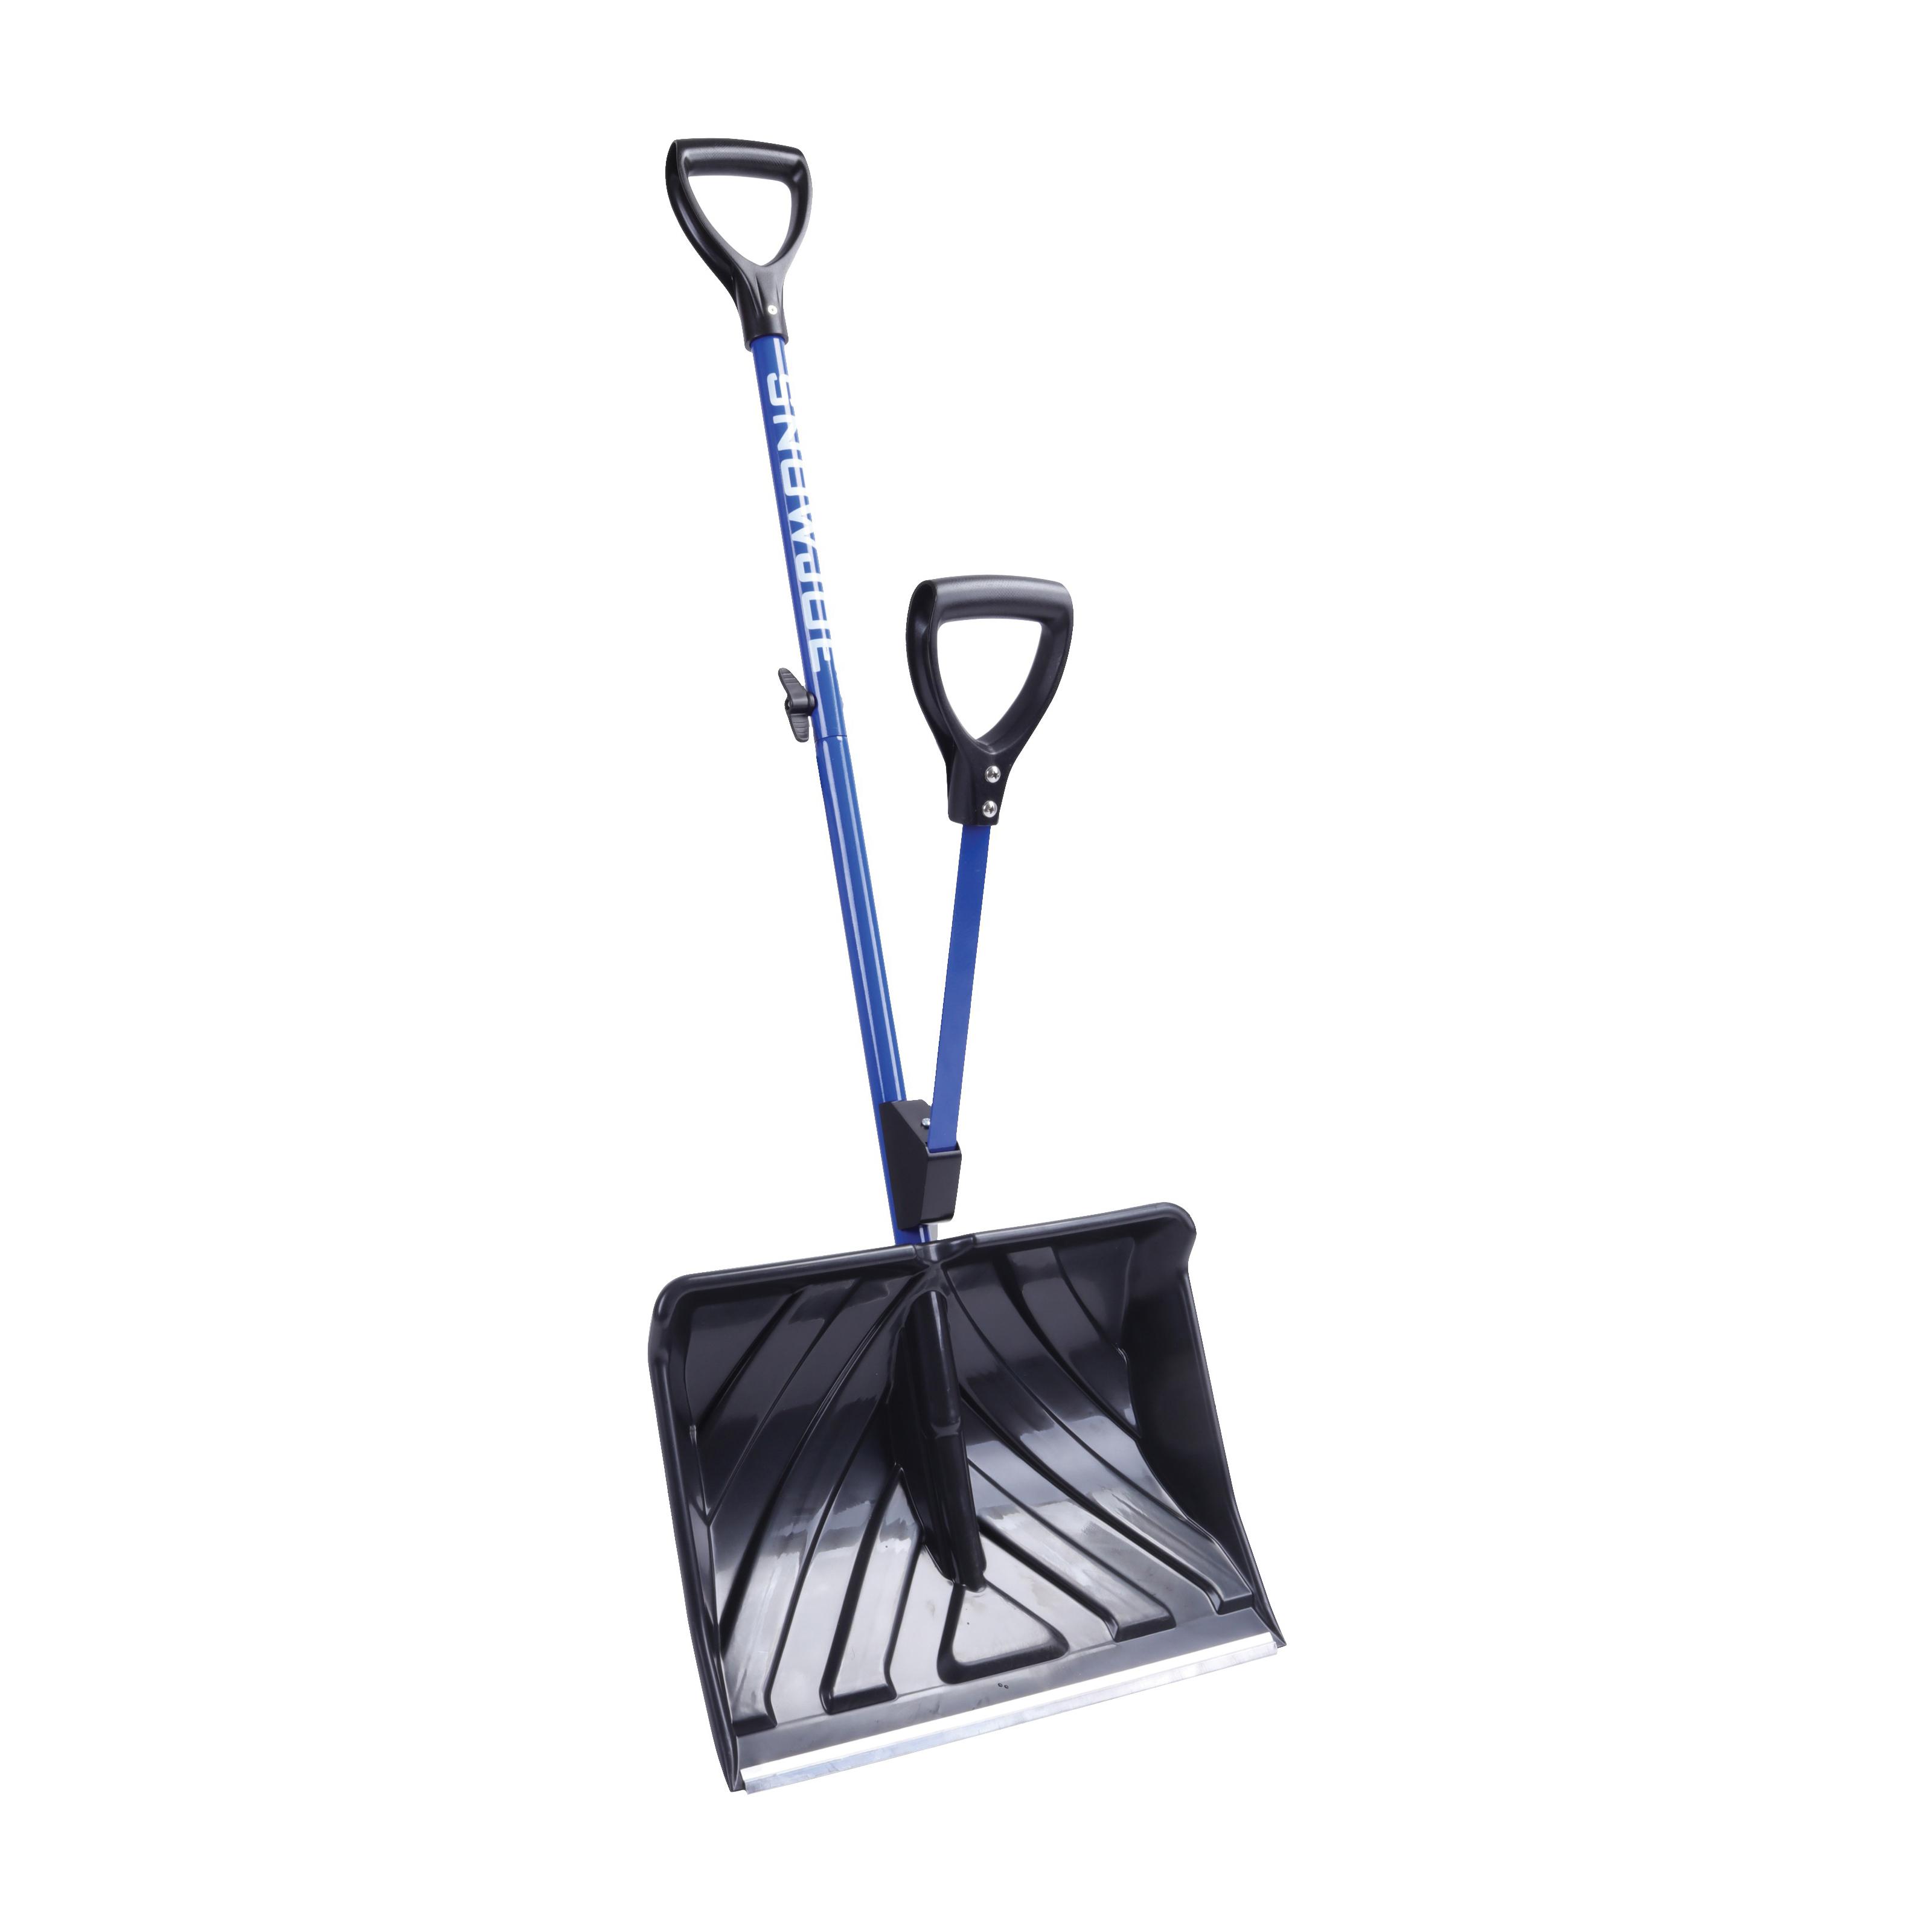 Picture of Snow Joe SJ-SHLV01 Strain-Reducing Snow Shovel, 18 in W Blade, 18 in L Blade, Polycarbonate Blade, 50 in OAL, Blue